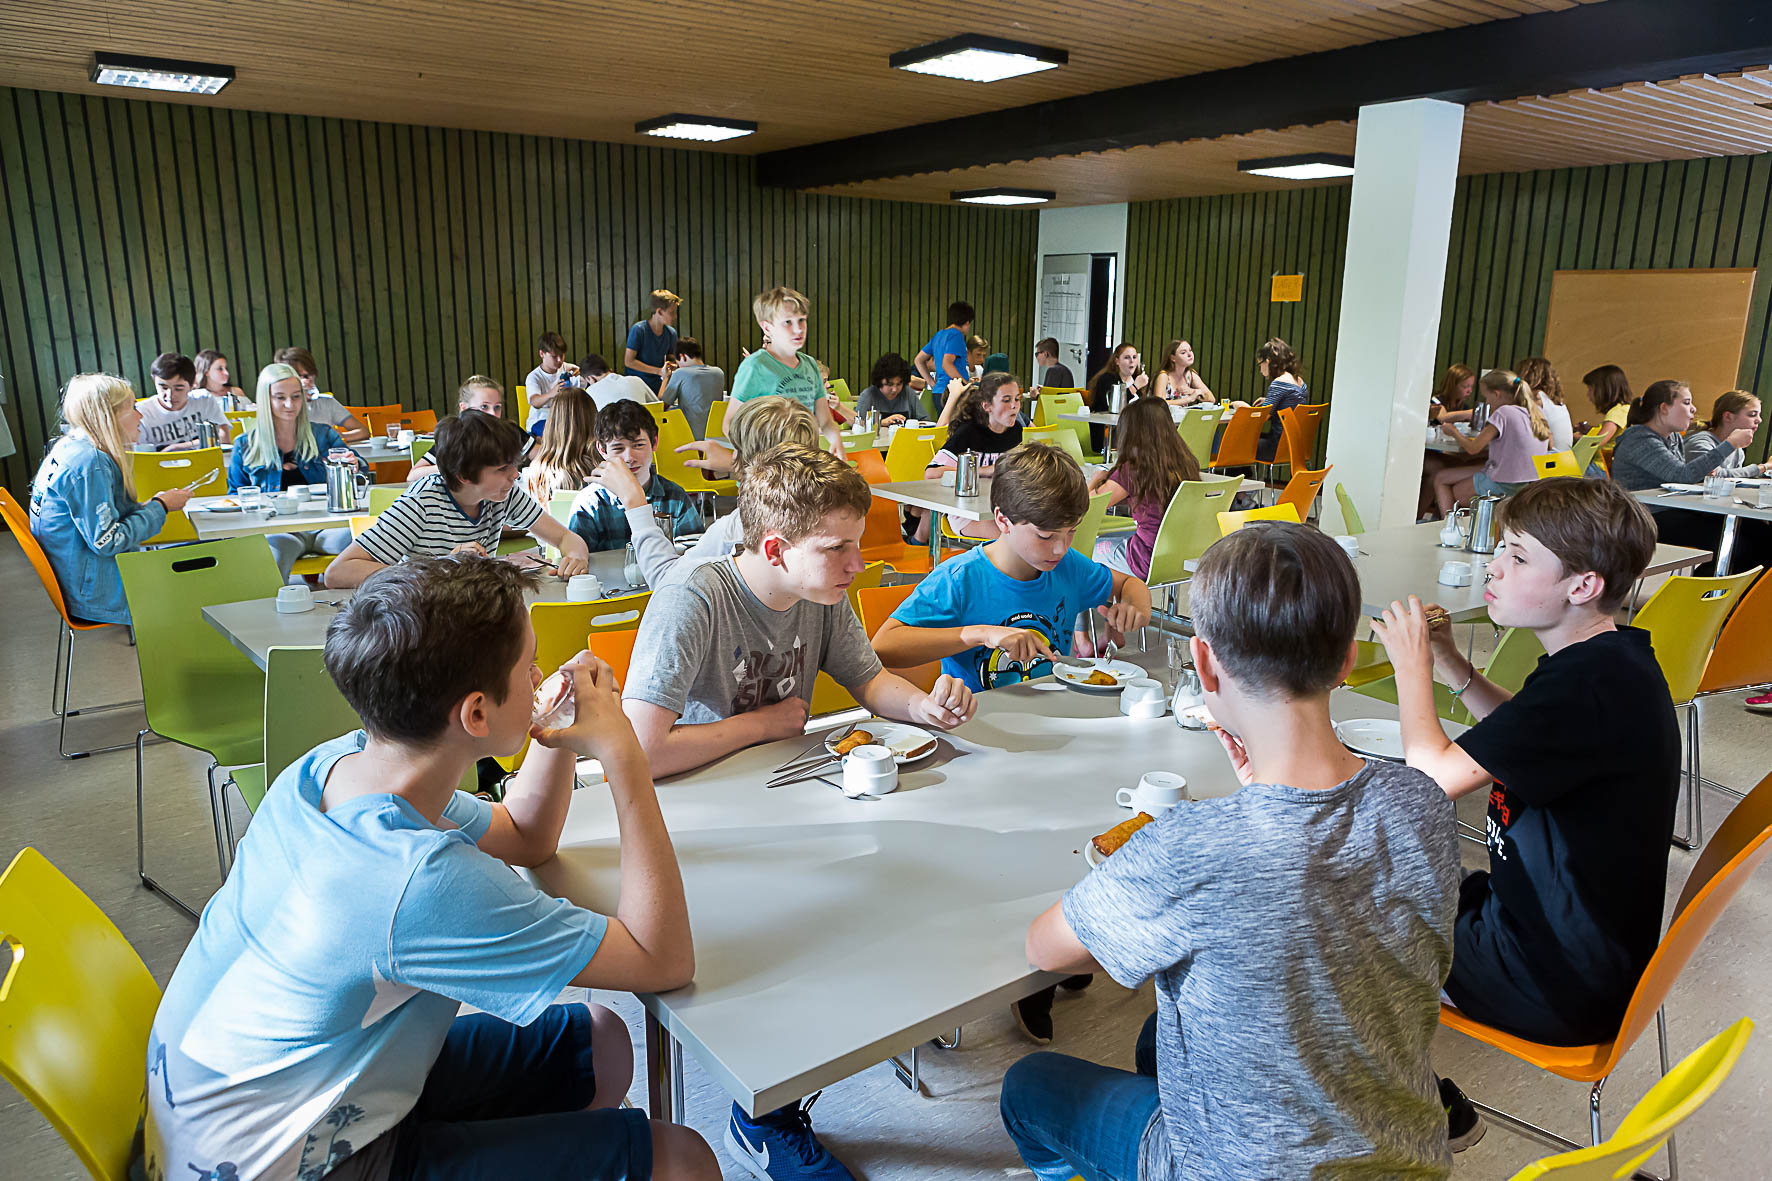 Jugendherberge Lindlar: Aufenthaltsraum